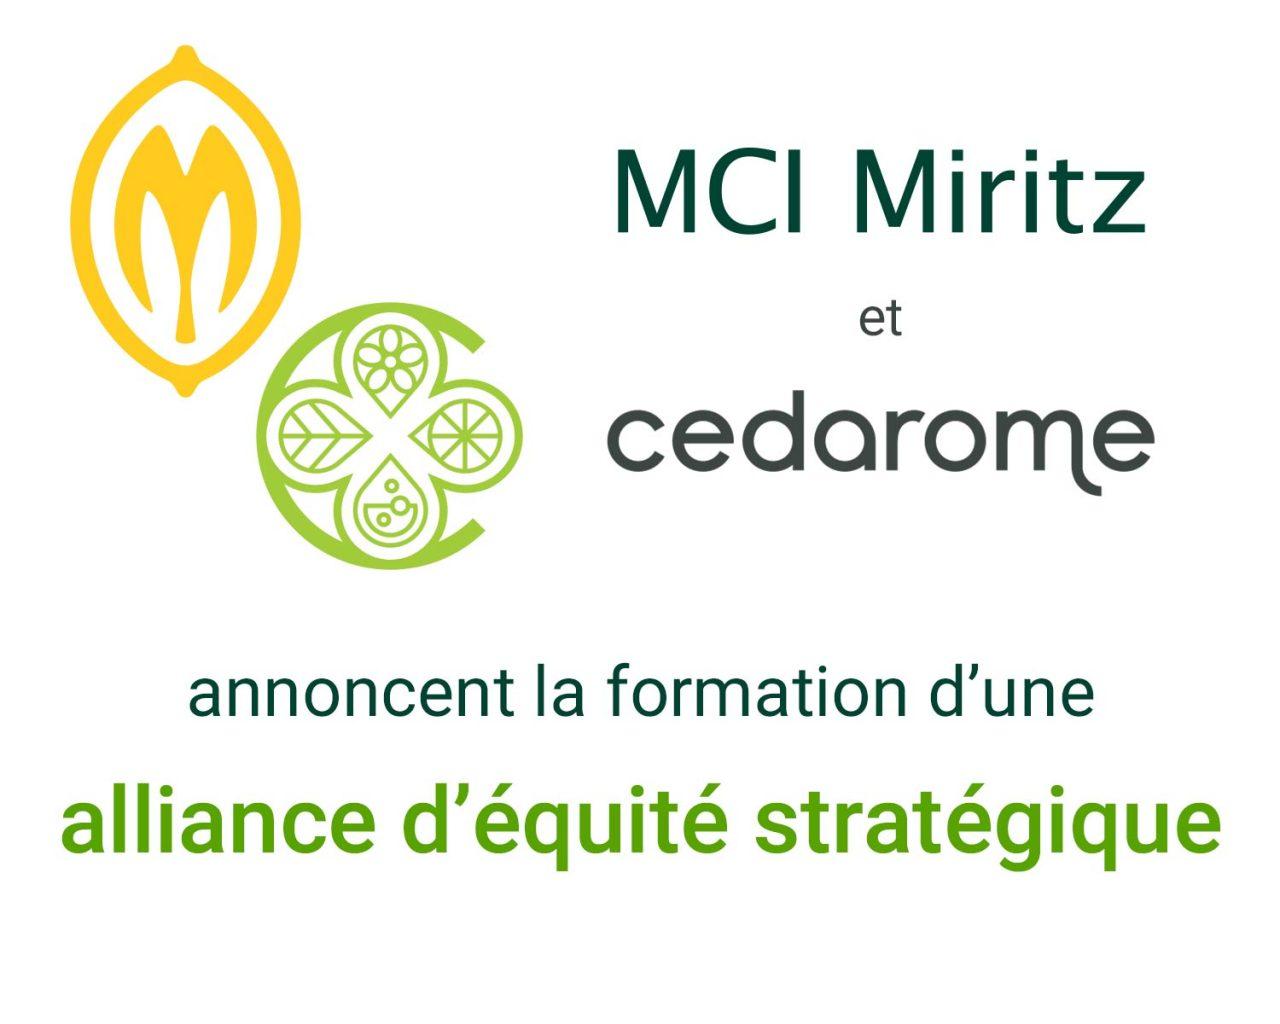 MCI Cedarome alliance equite strategique_p